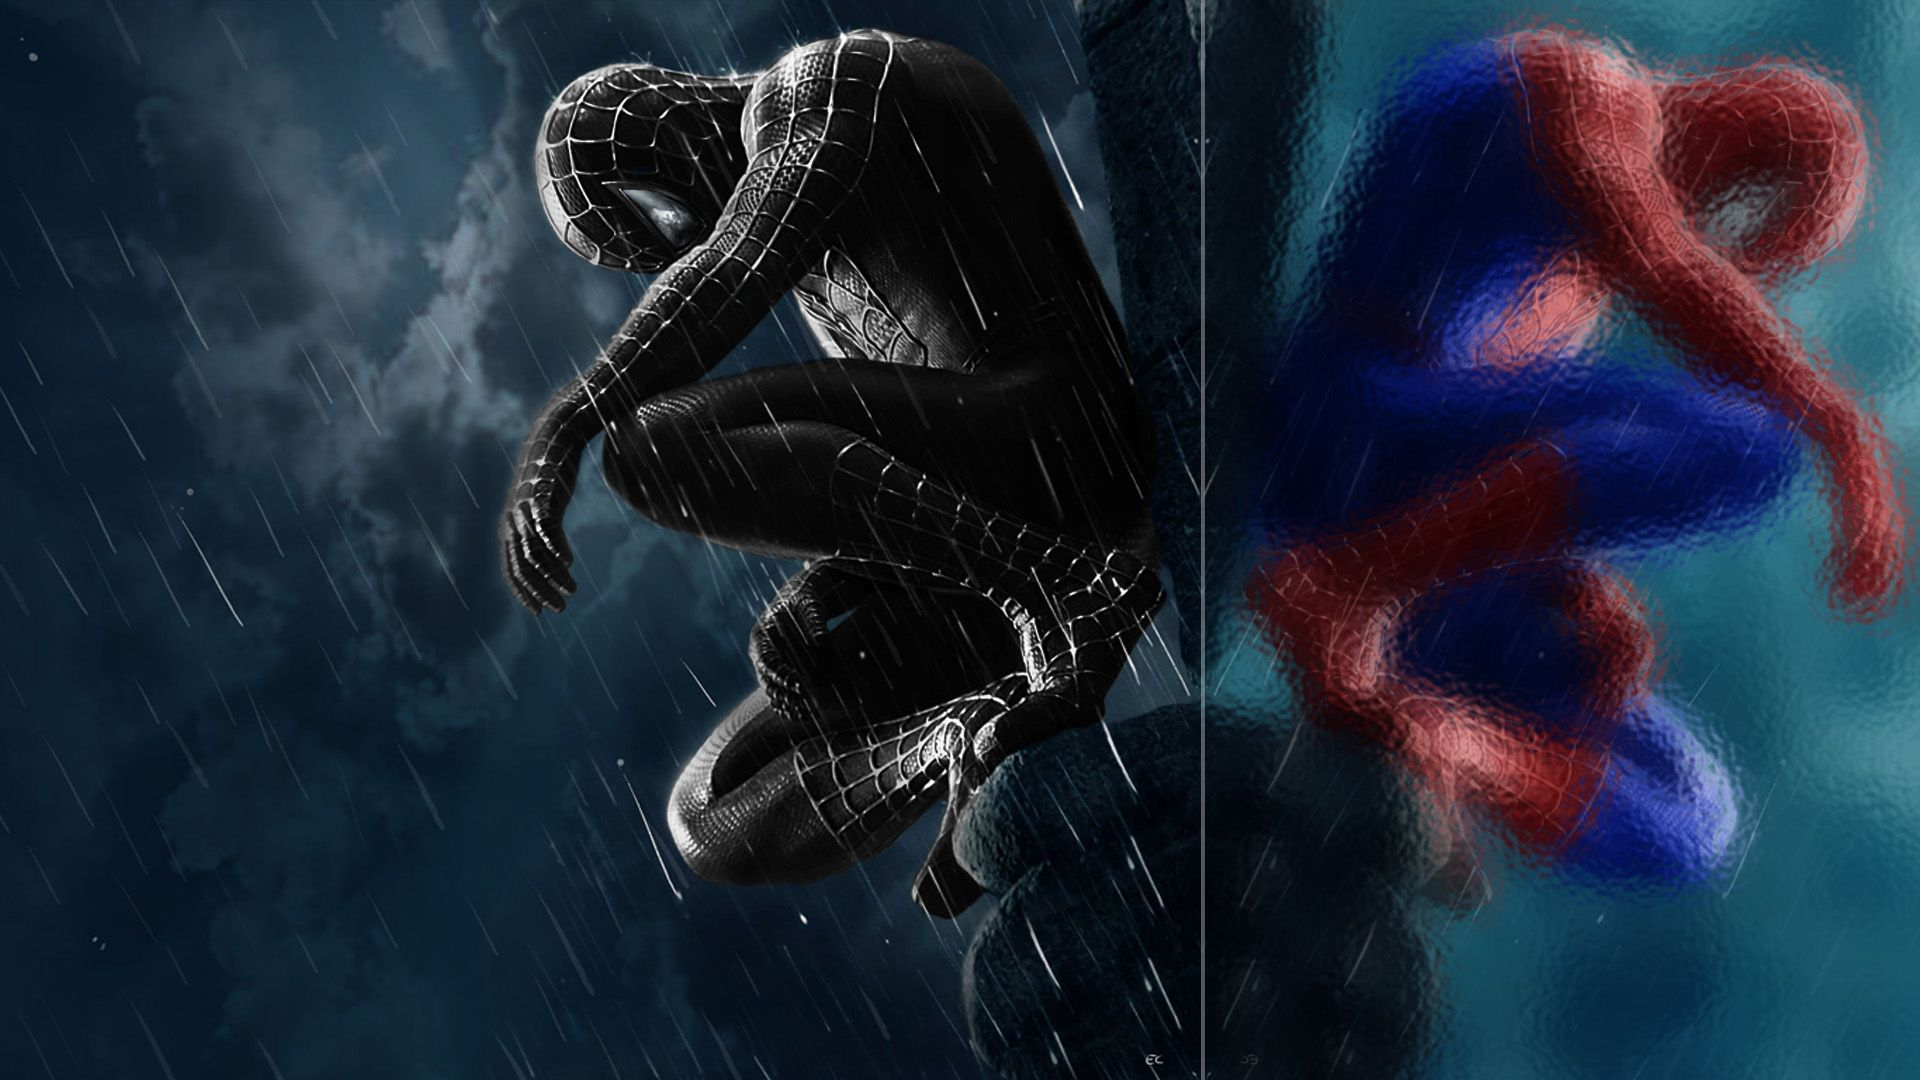 Spider Man HD Wallpapers Wallpaper